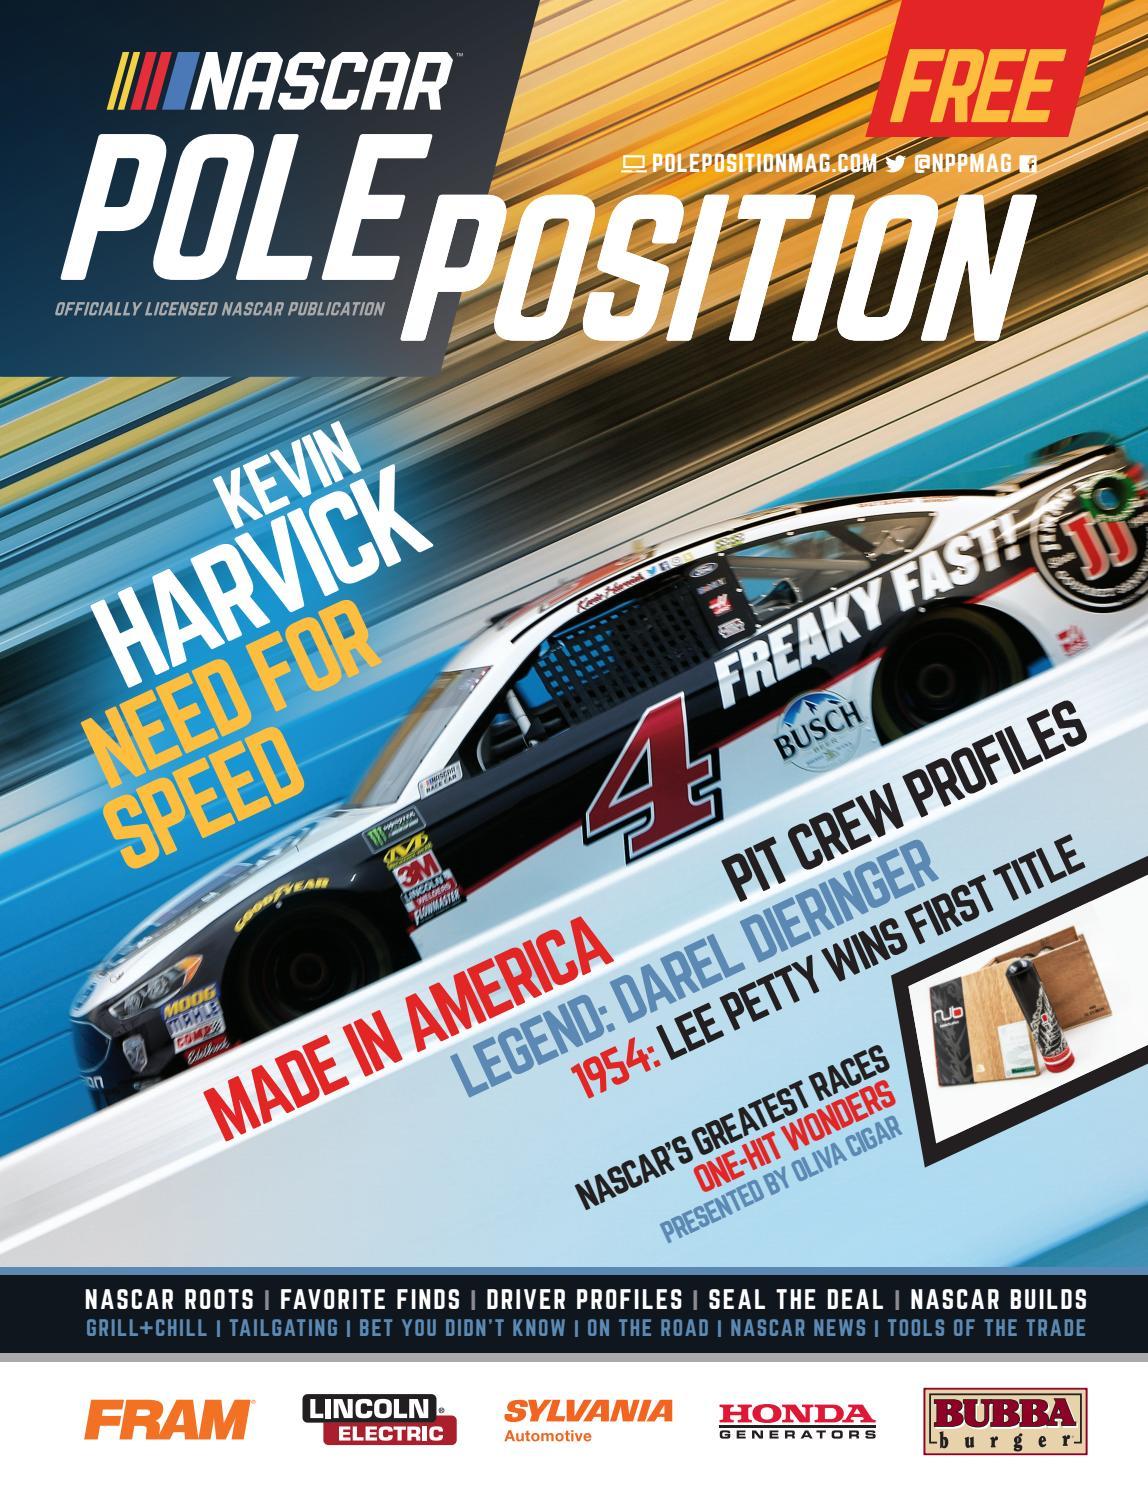 NASCAR Driver 12 x 18 2-Sided Garden Flag 2017 Graphics Danica Patrick